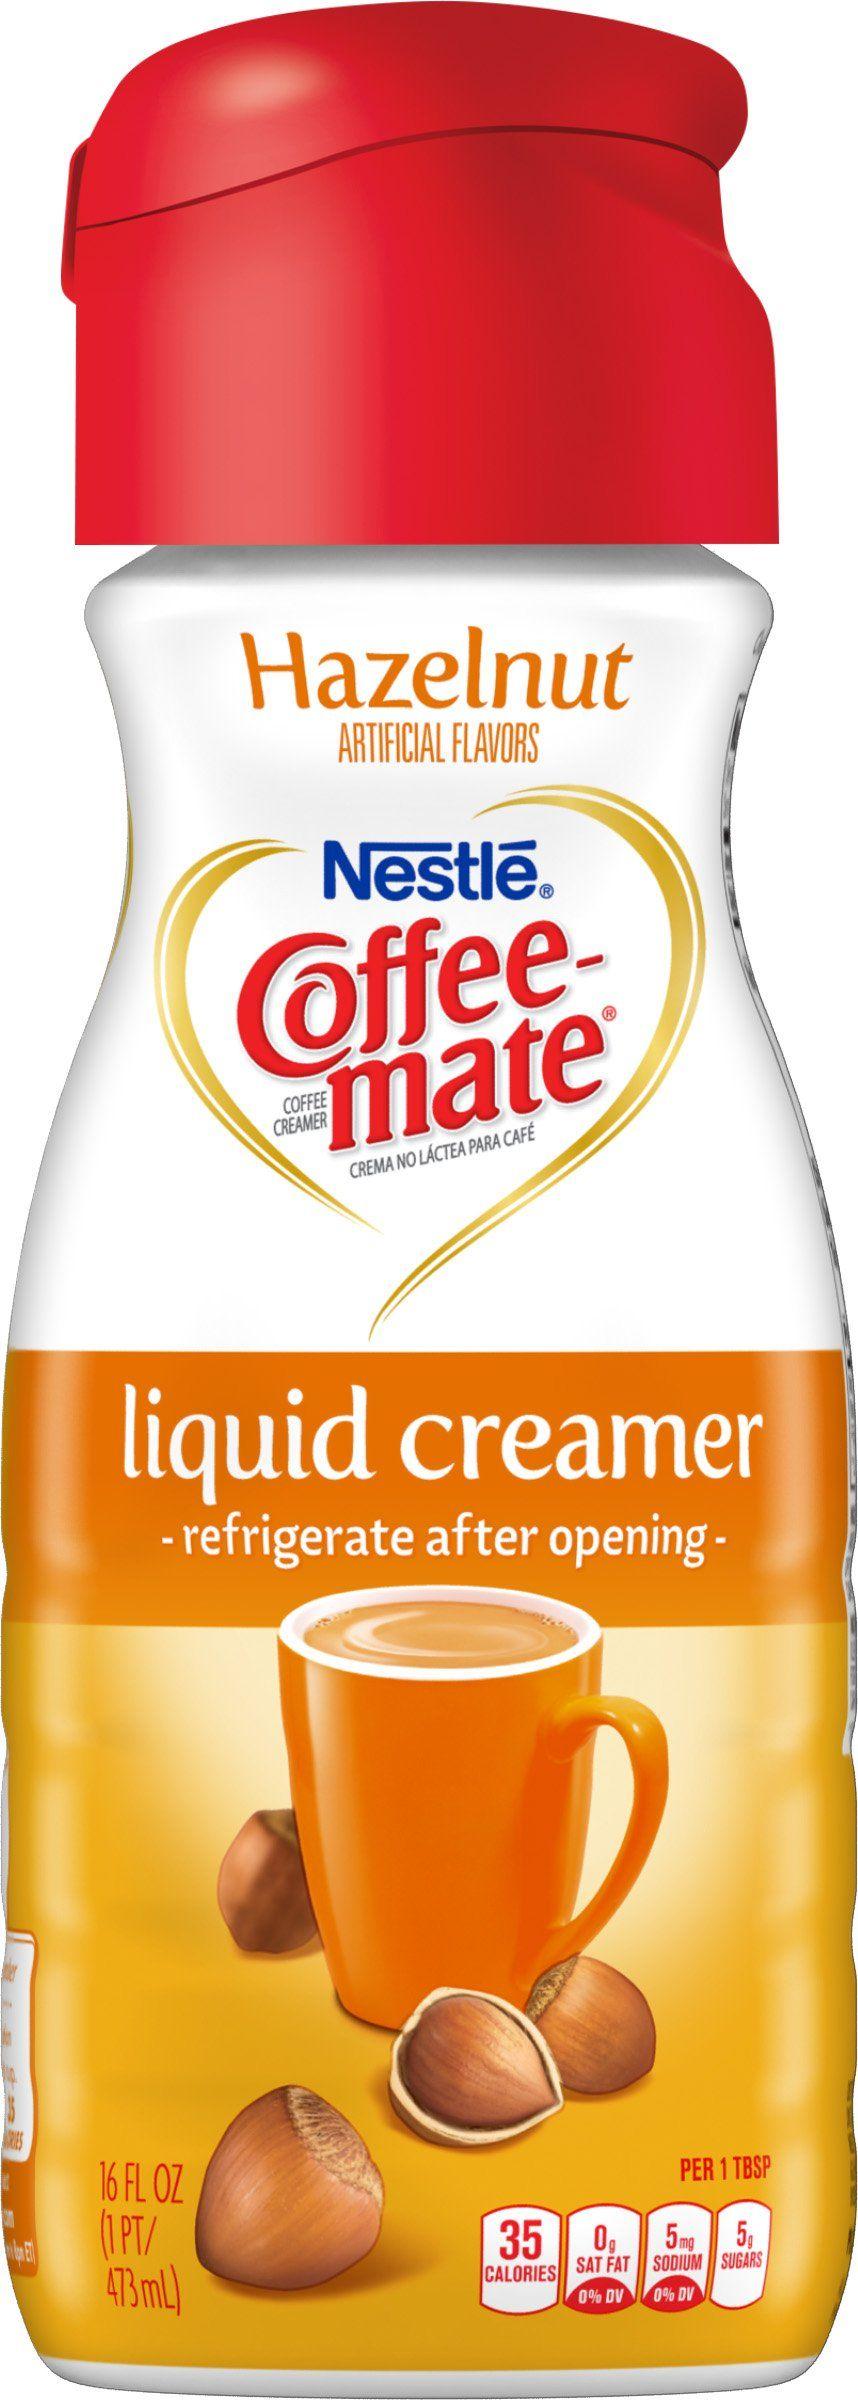 Coffeemate hazelnut liquid coffee creamer 16 fluid ounce